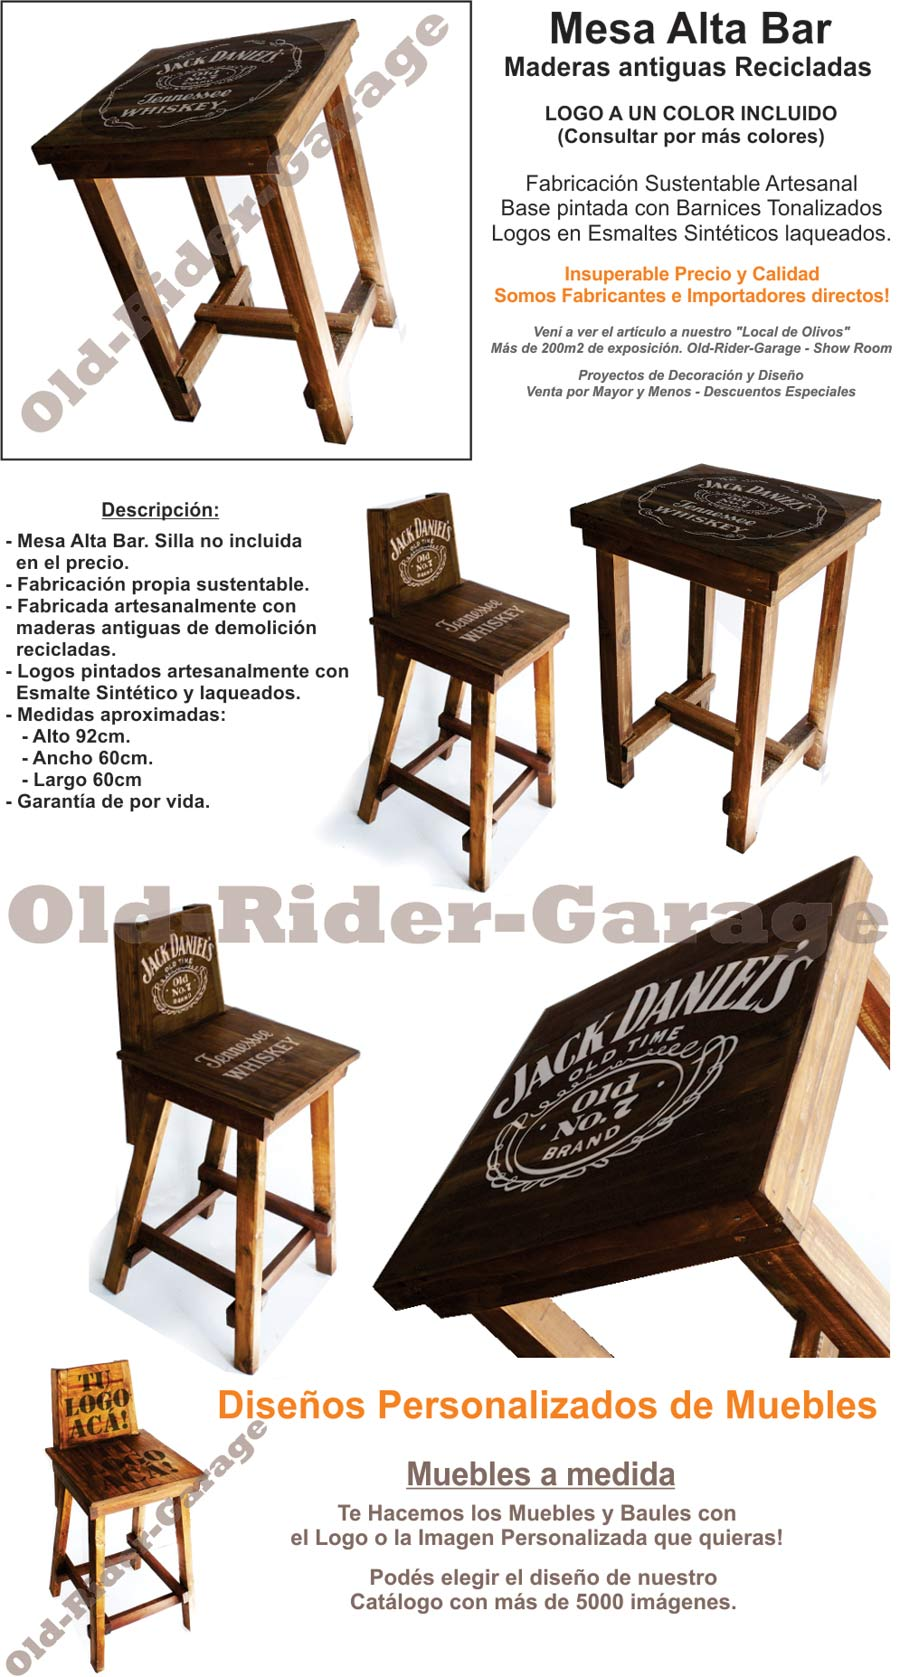 Mesa alta bar madera antigua reciclada jack daniels for Mesa carro bar madera